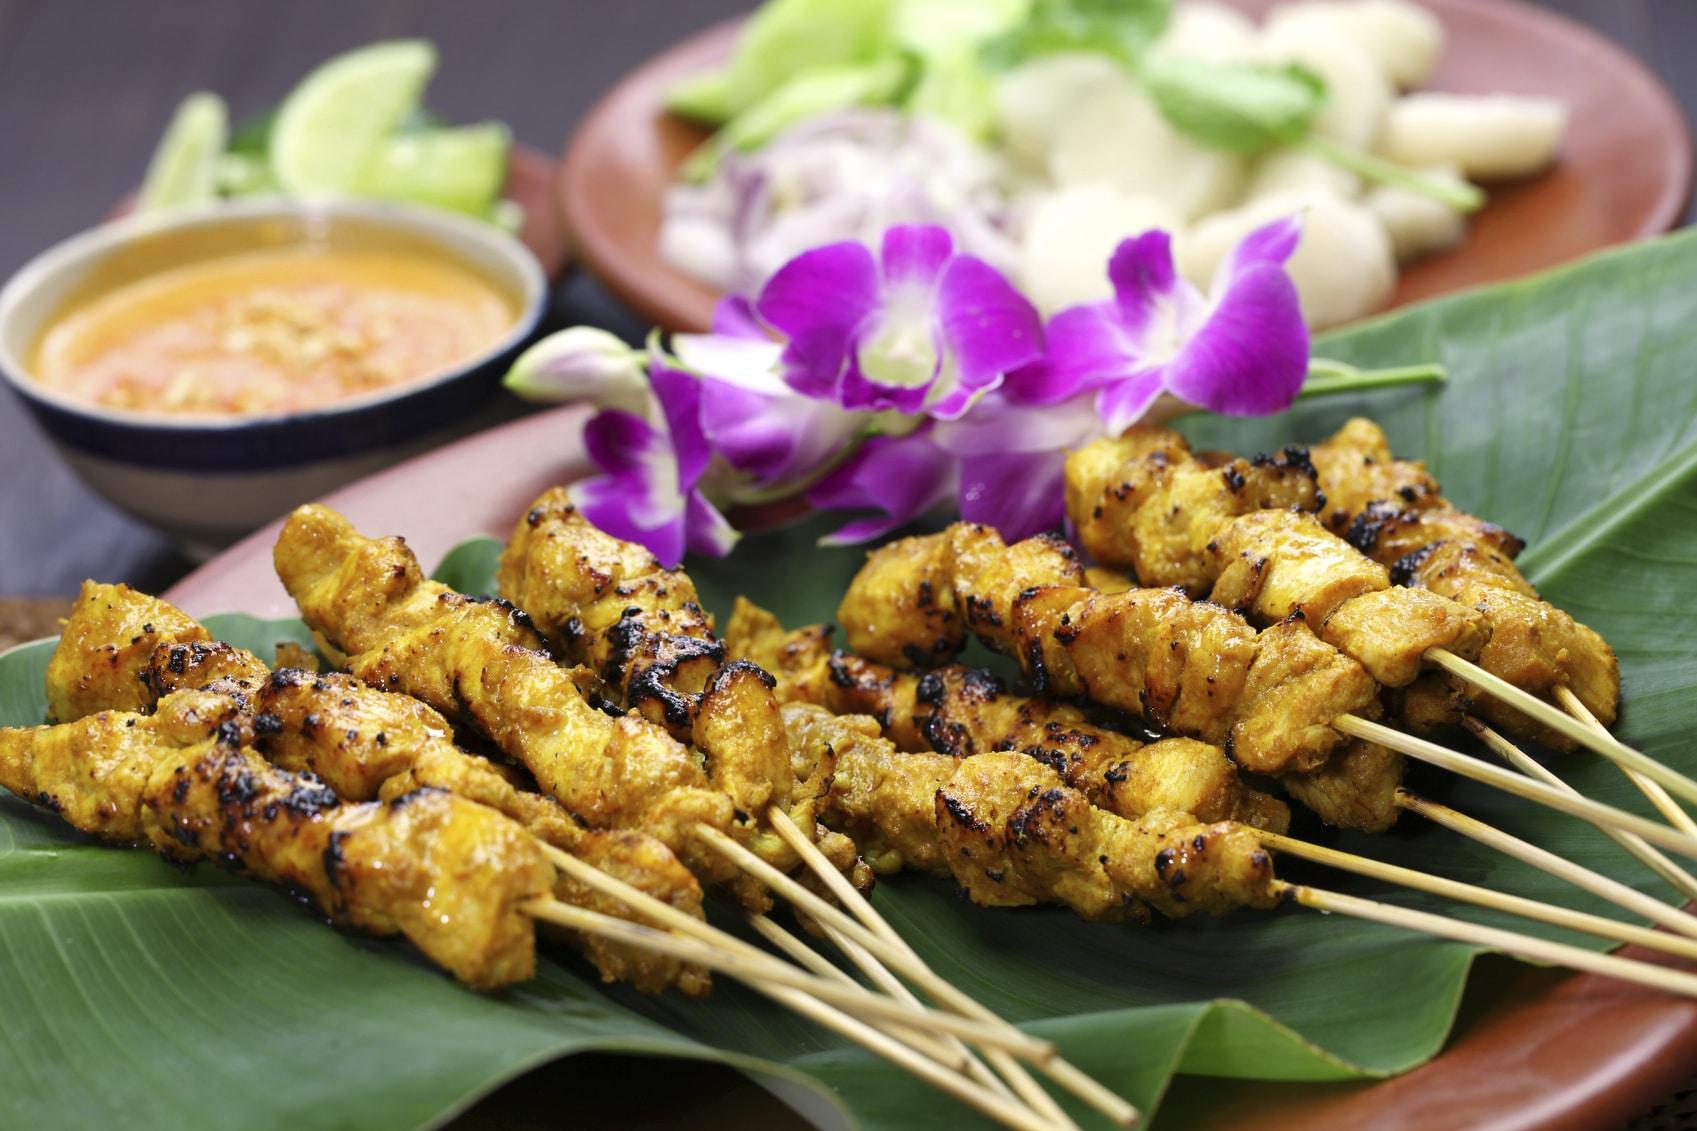 malaisie cuisine brochette satai